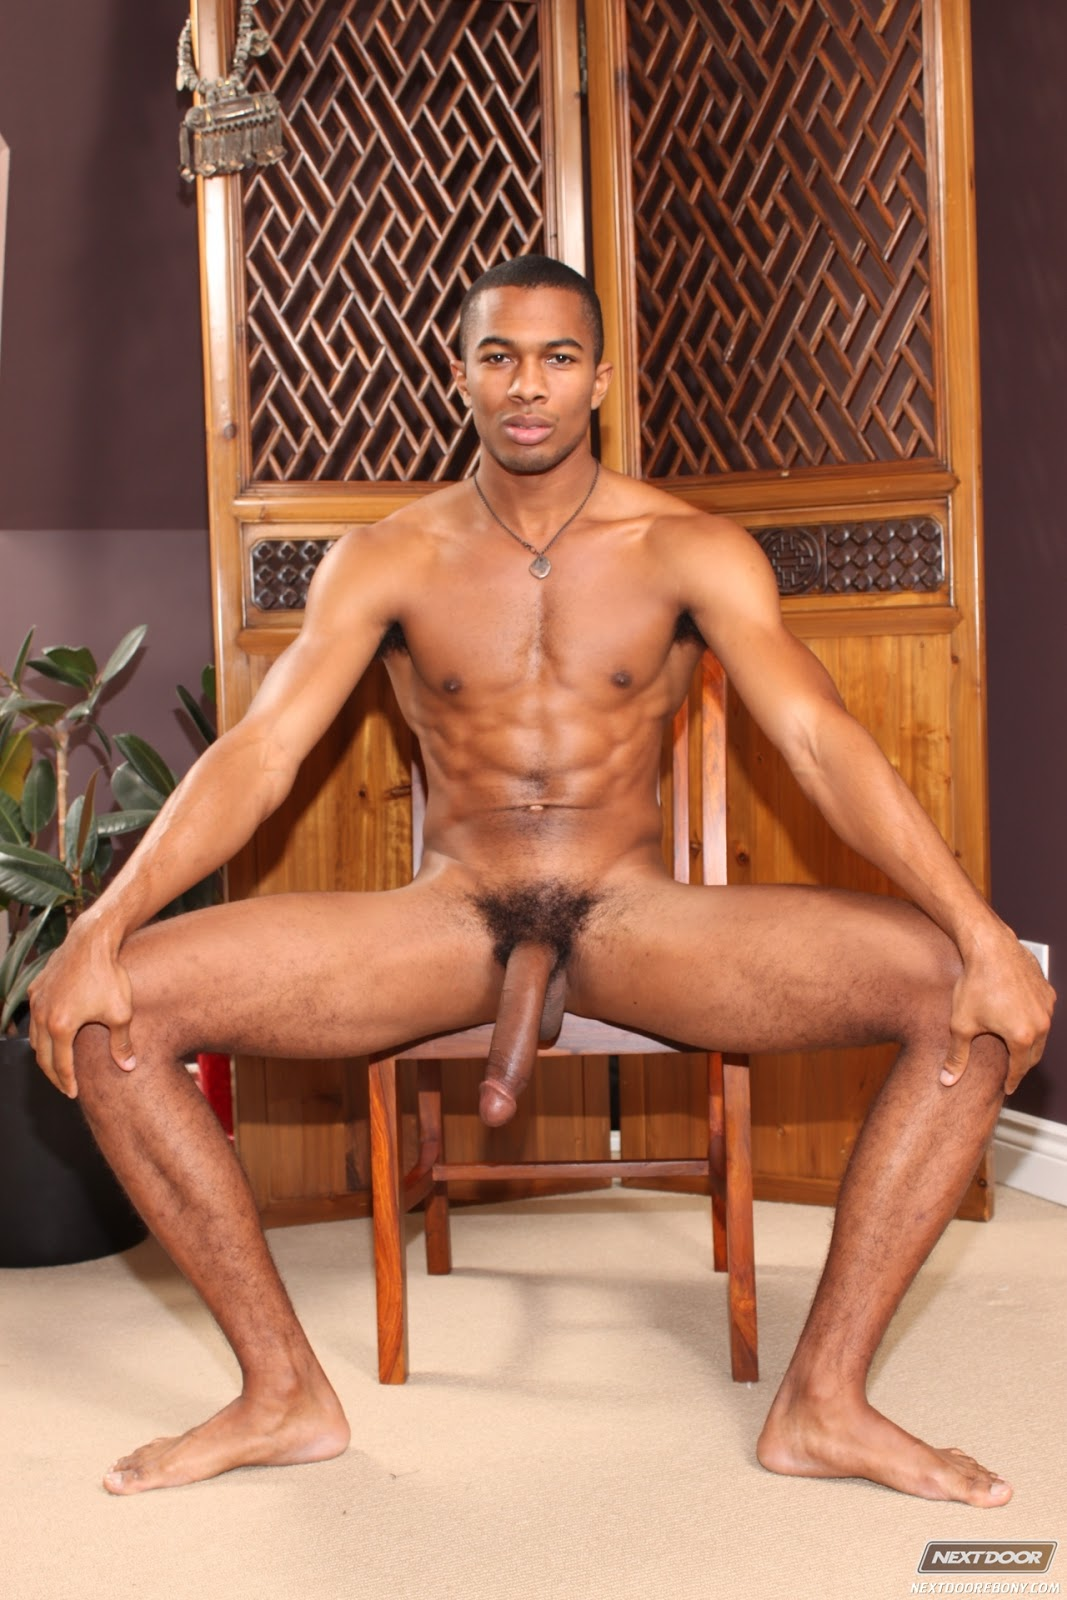 Naked sean hd video download adult scenes